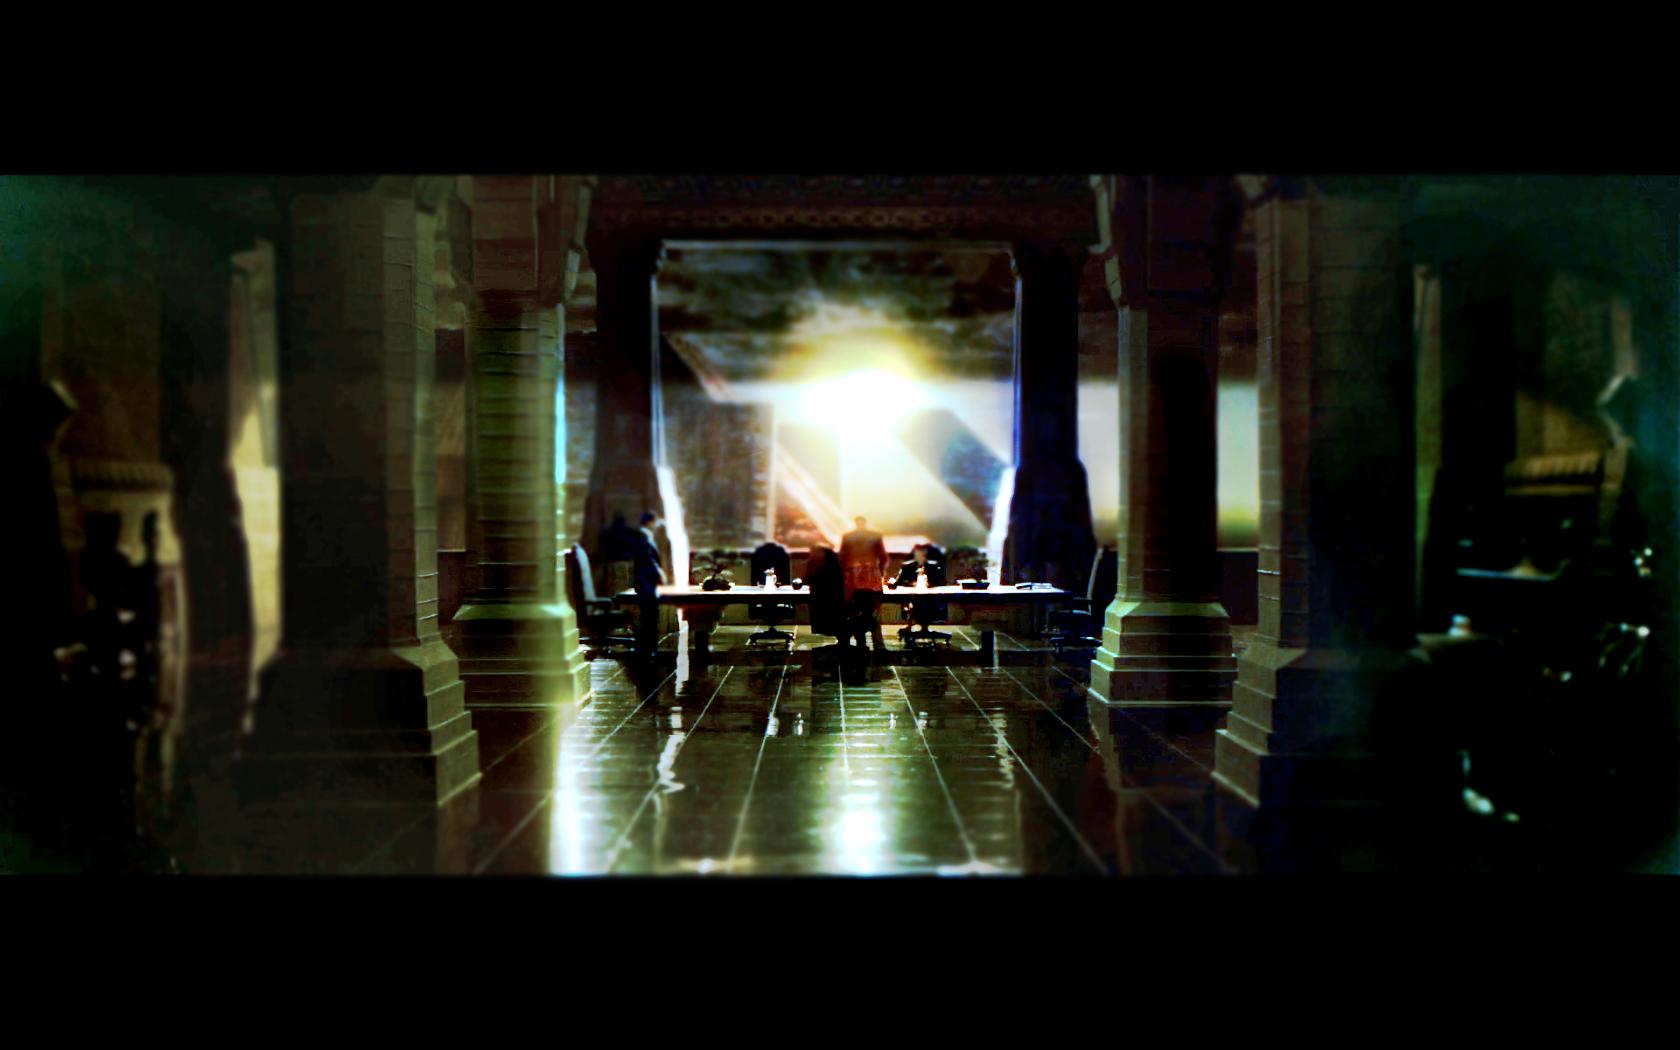 Blade Runner Computer Wallpapers Desktop Backgrounds 1680x1050 ID 1680x1050